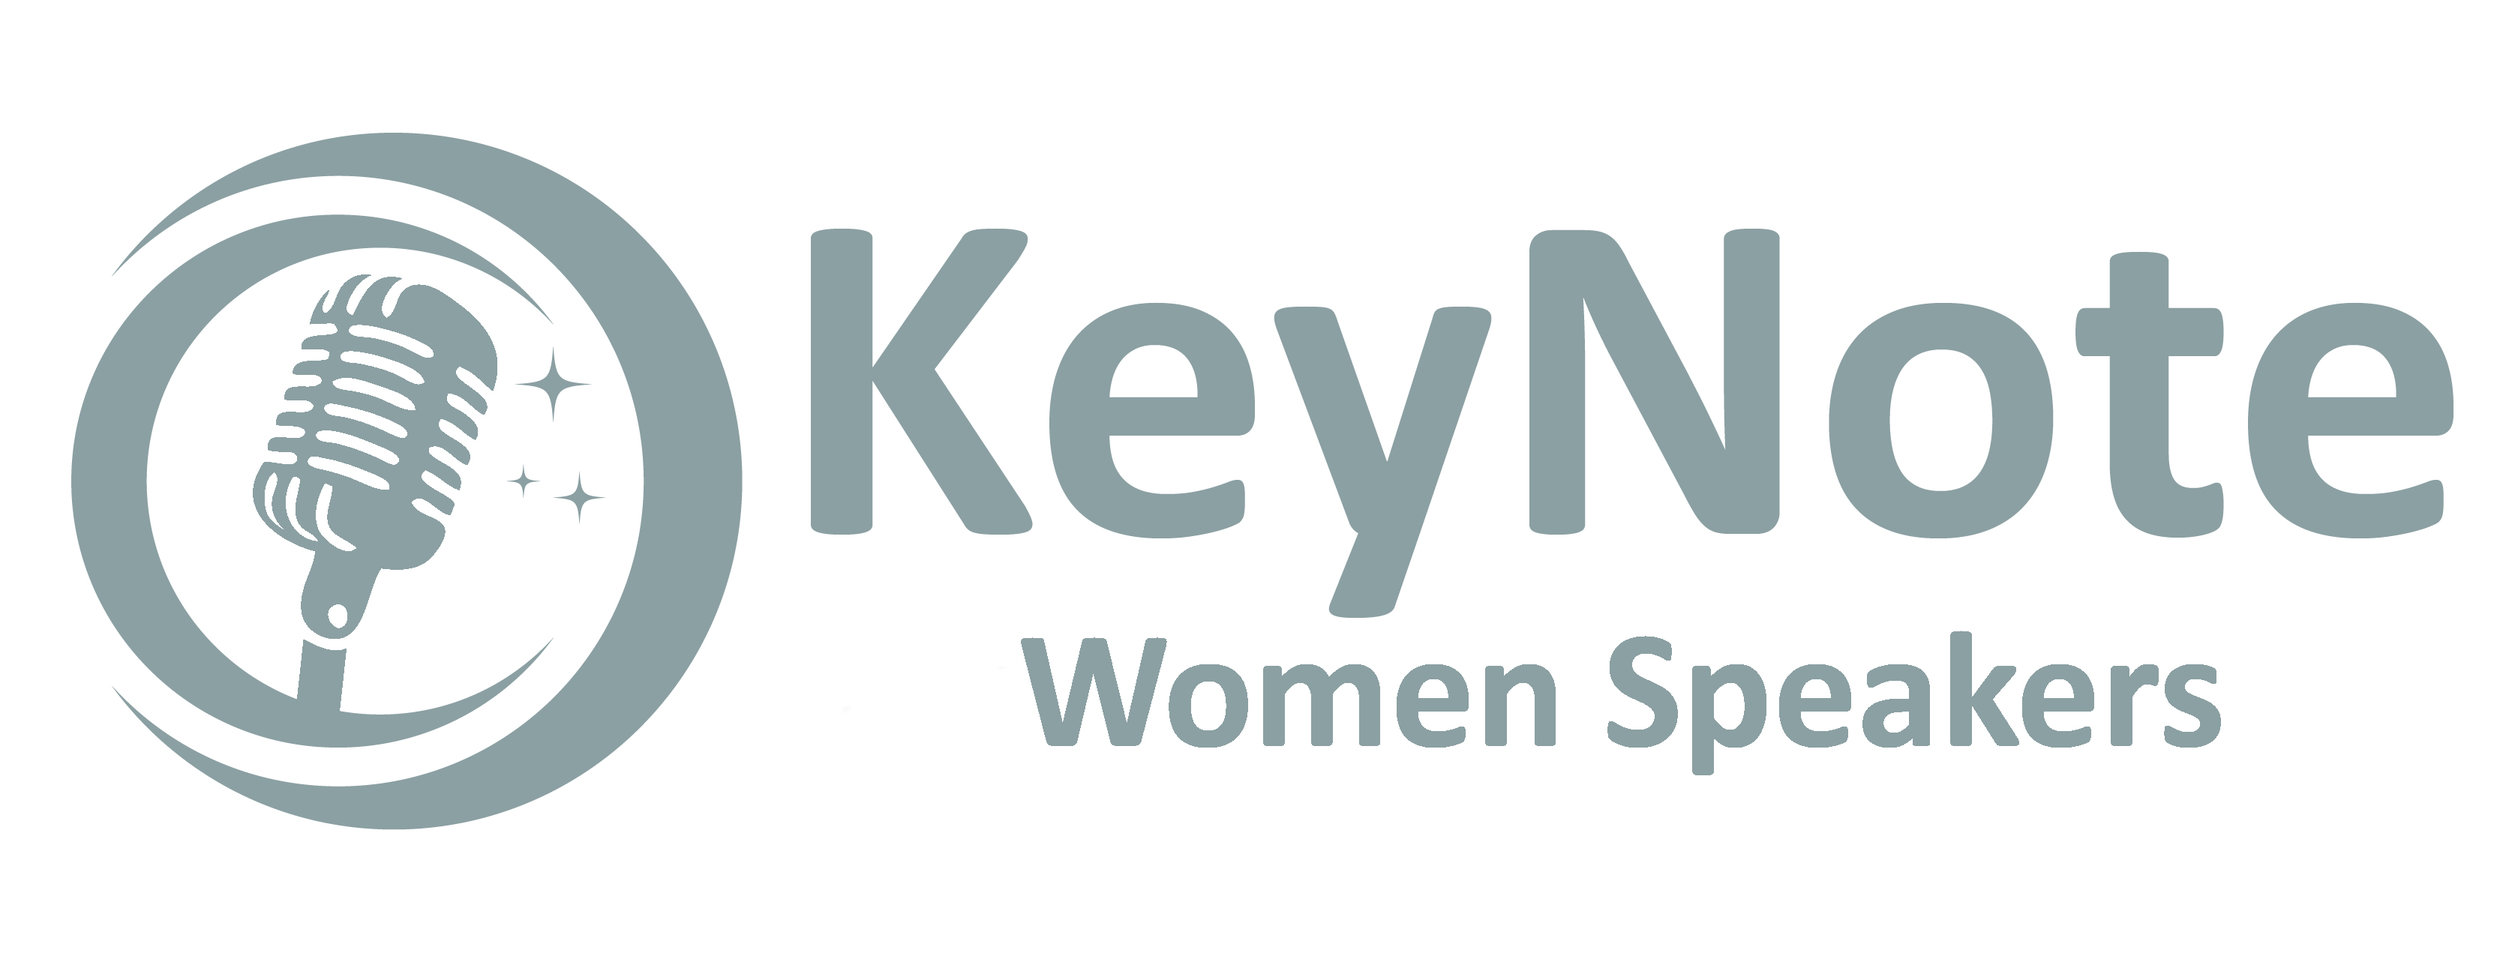 New KeyNote Logo 05.03.2019 Updated copy.jpg